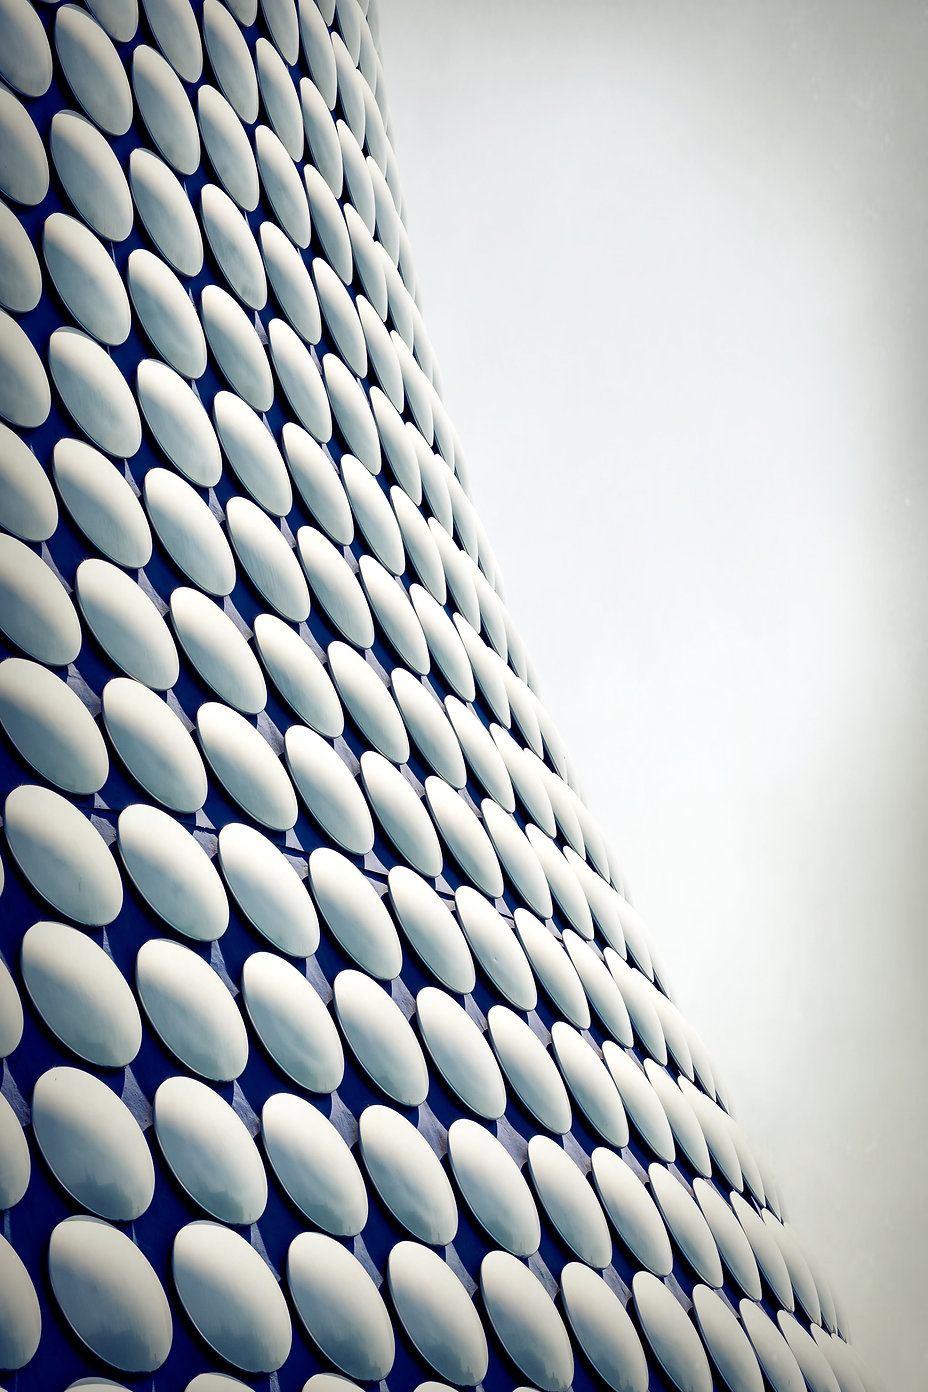 Gestalt Birmingham, bullring